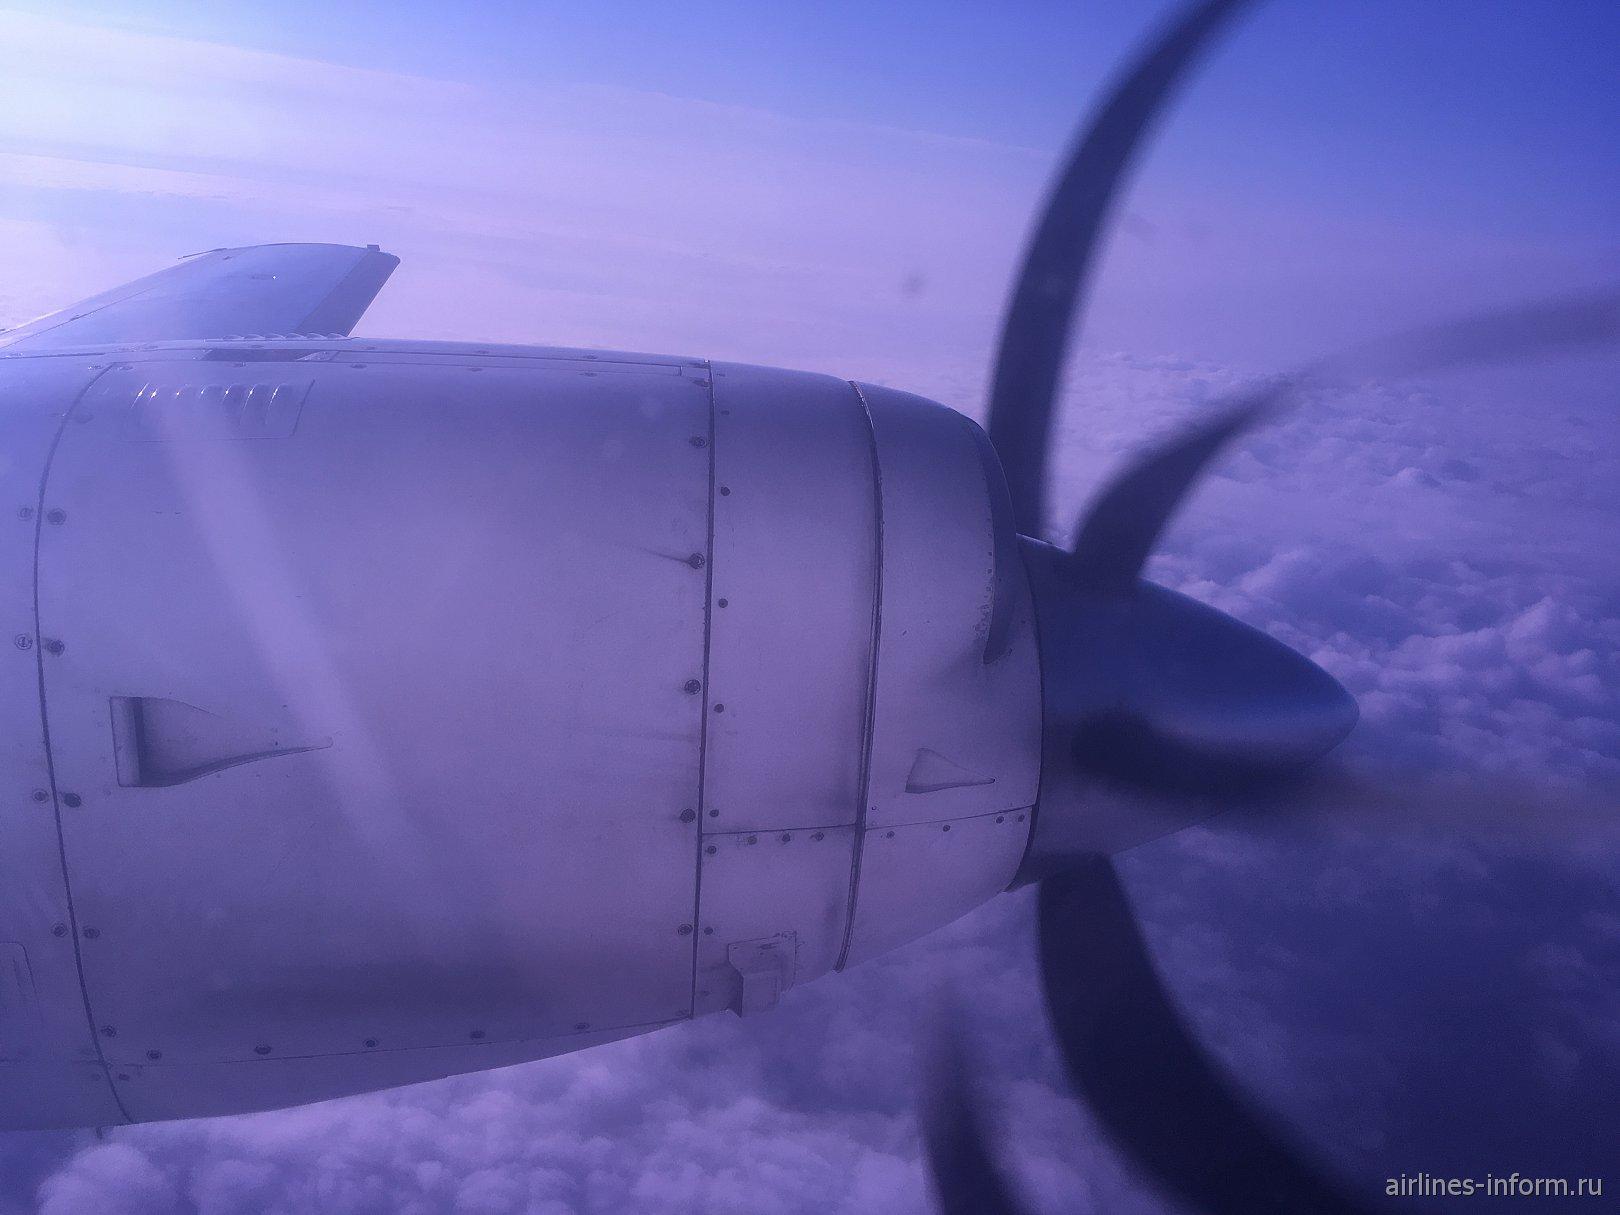 Неизведанная Европа: Таллин (TLL) - Курессааре (URE) на J32 (British Aerospace Jetstream 32) с KTB Transaviabaltica